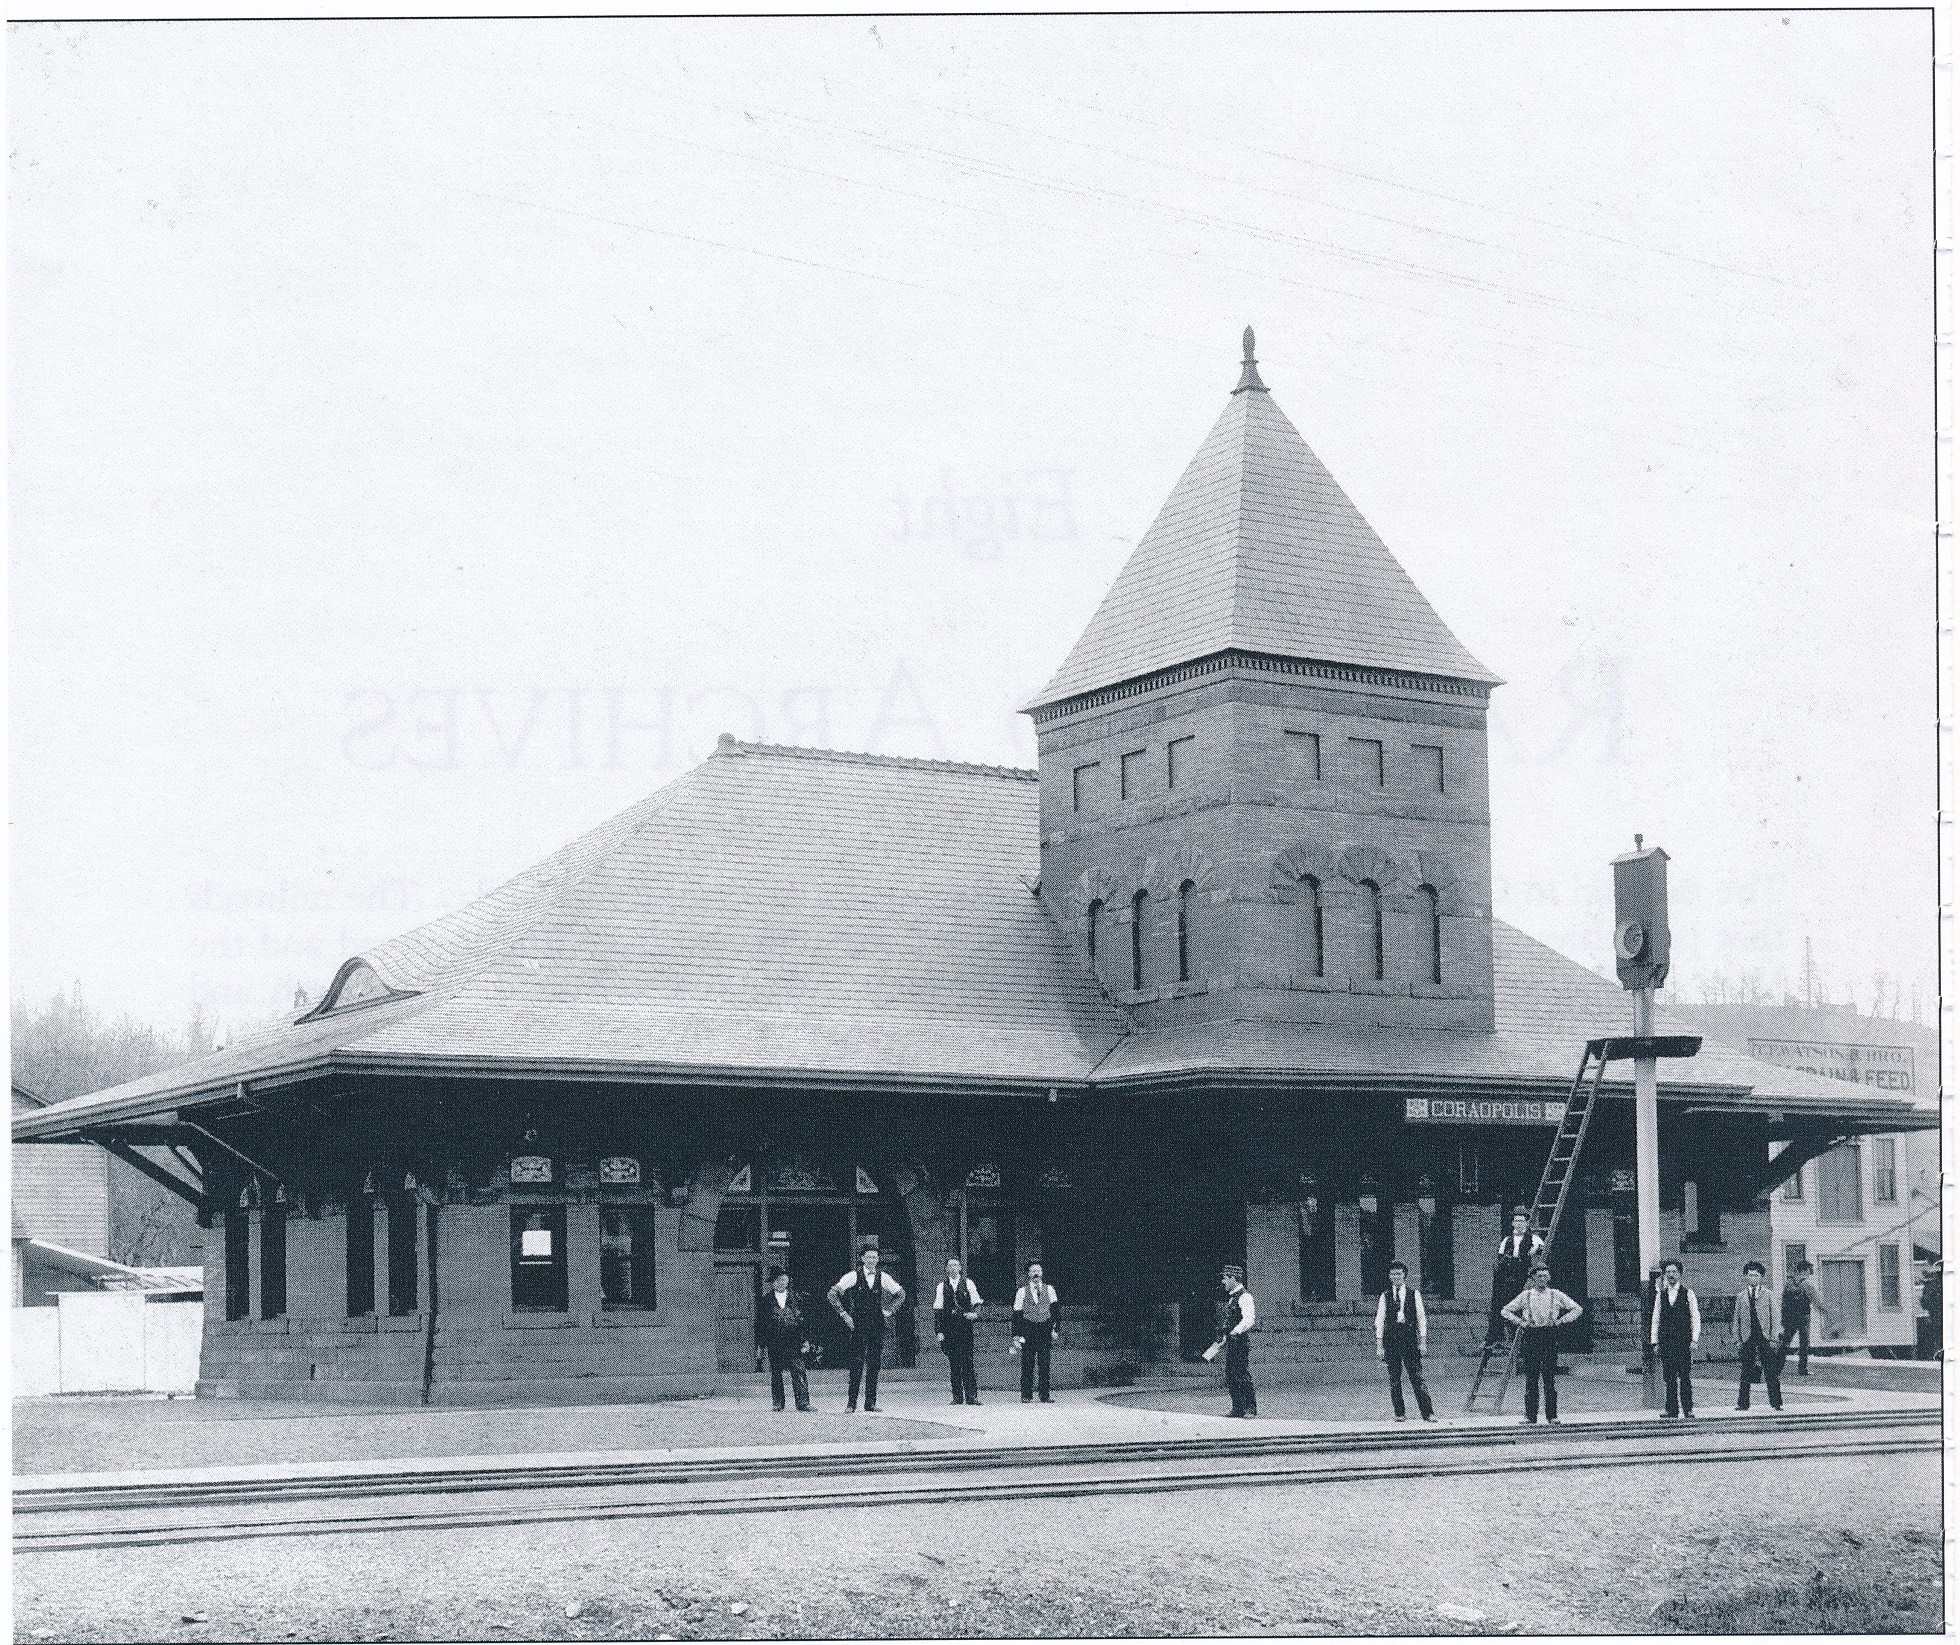 Coraopolis Passenger Train Station - PLERR - late 1800s.jpg